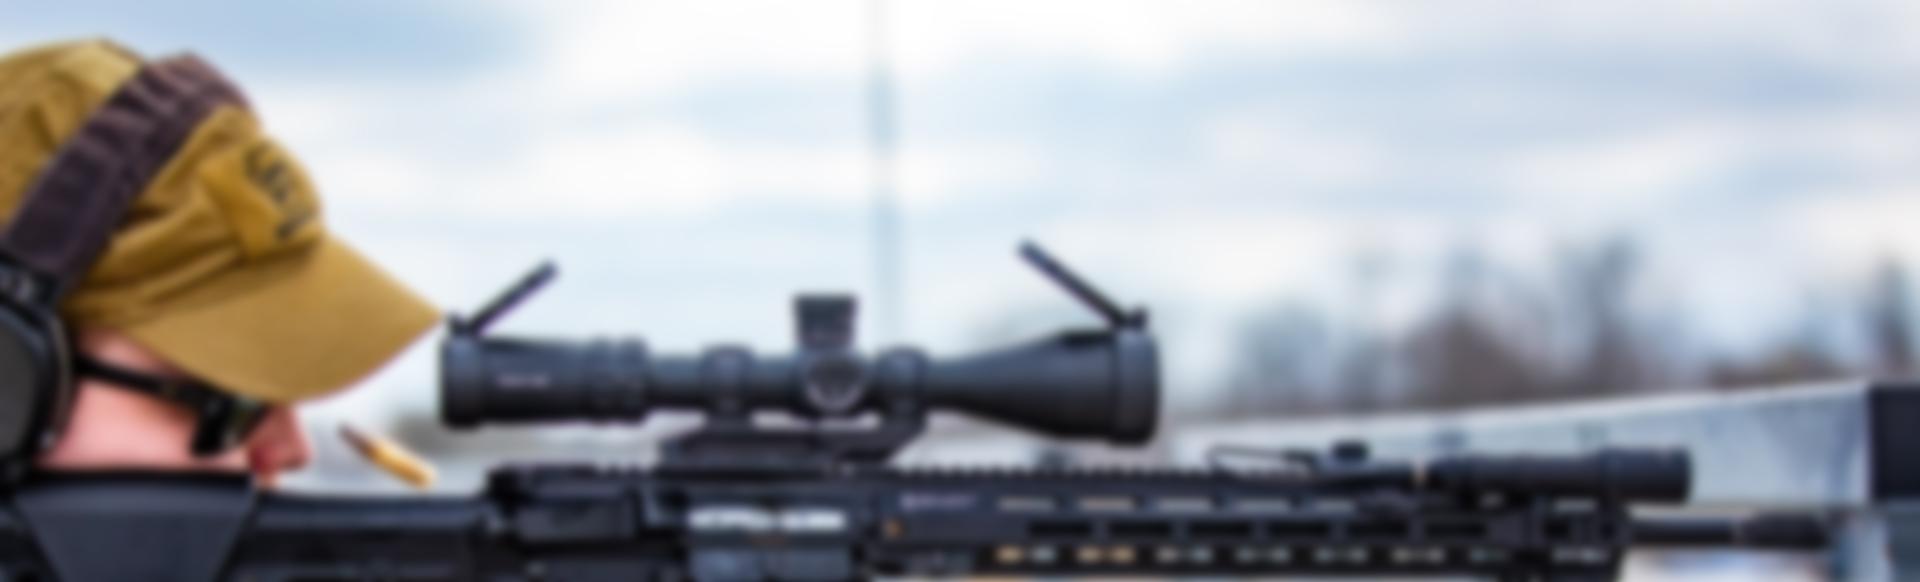 gun affiliate program